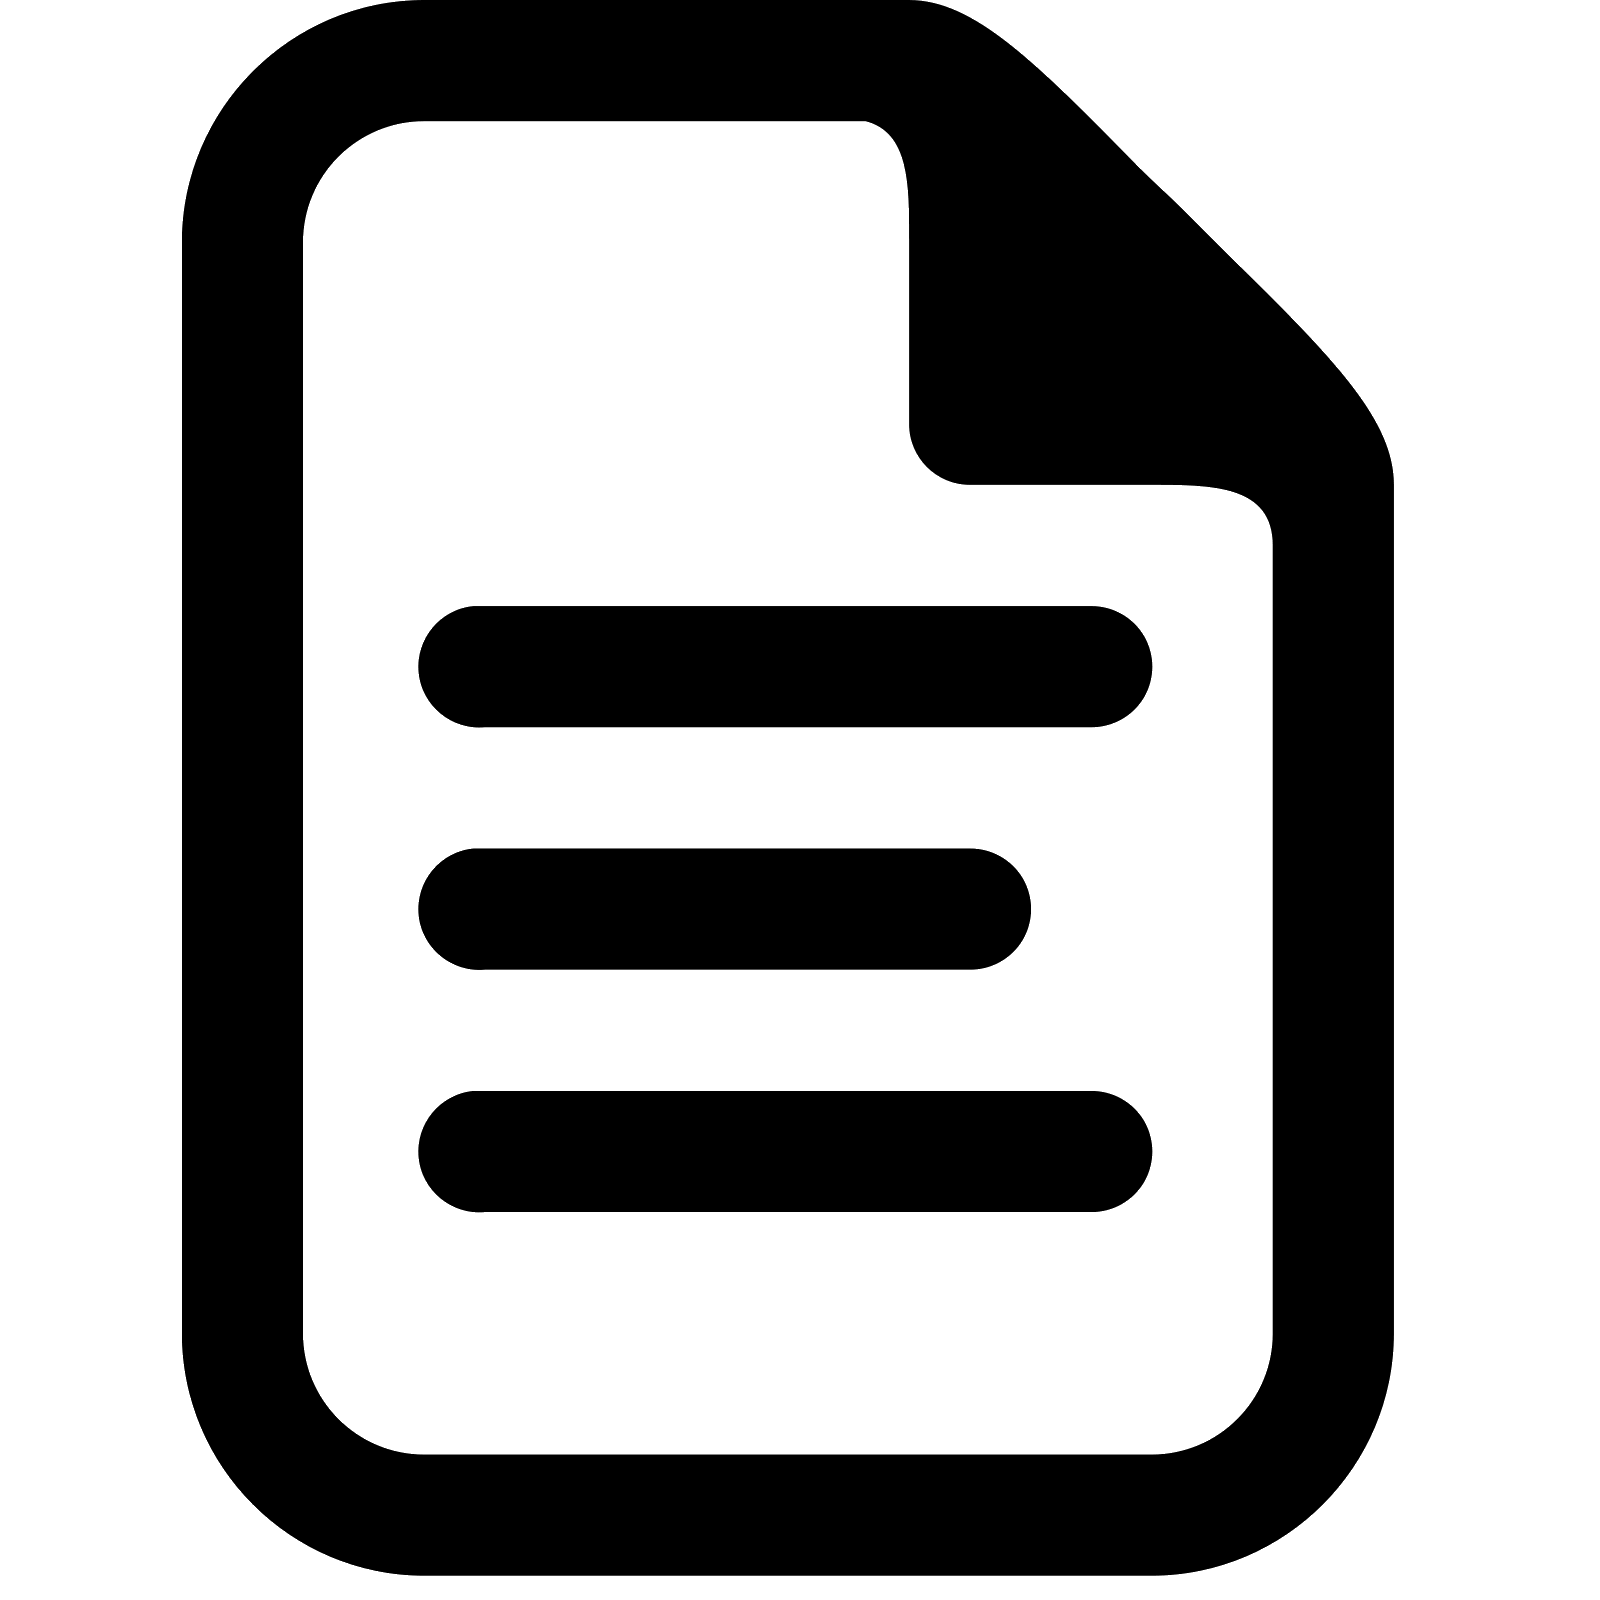 Spidermaiden-script.pdf